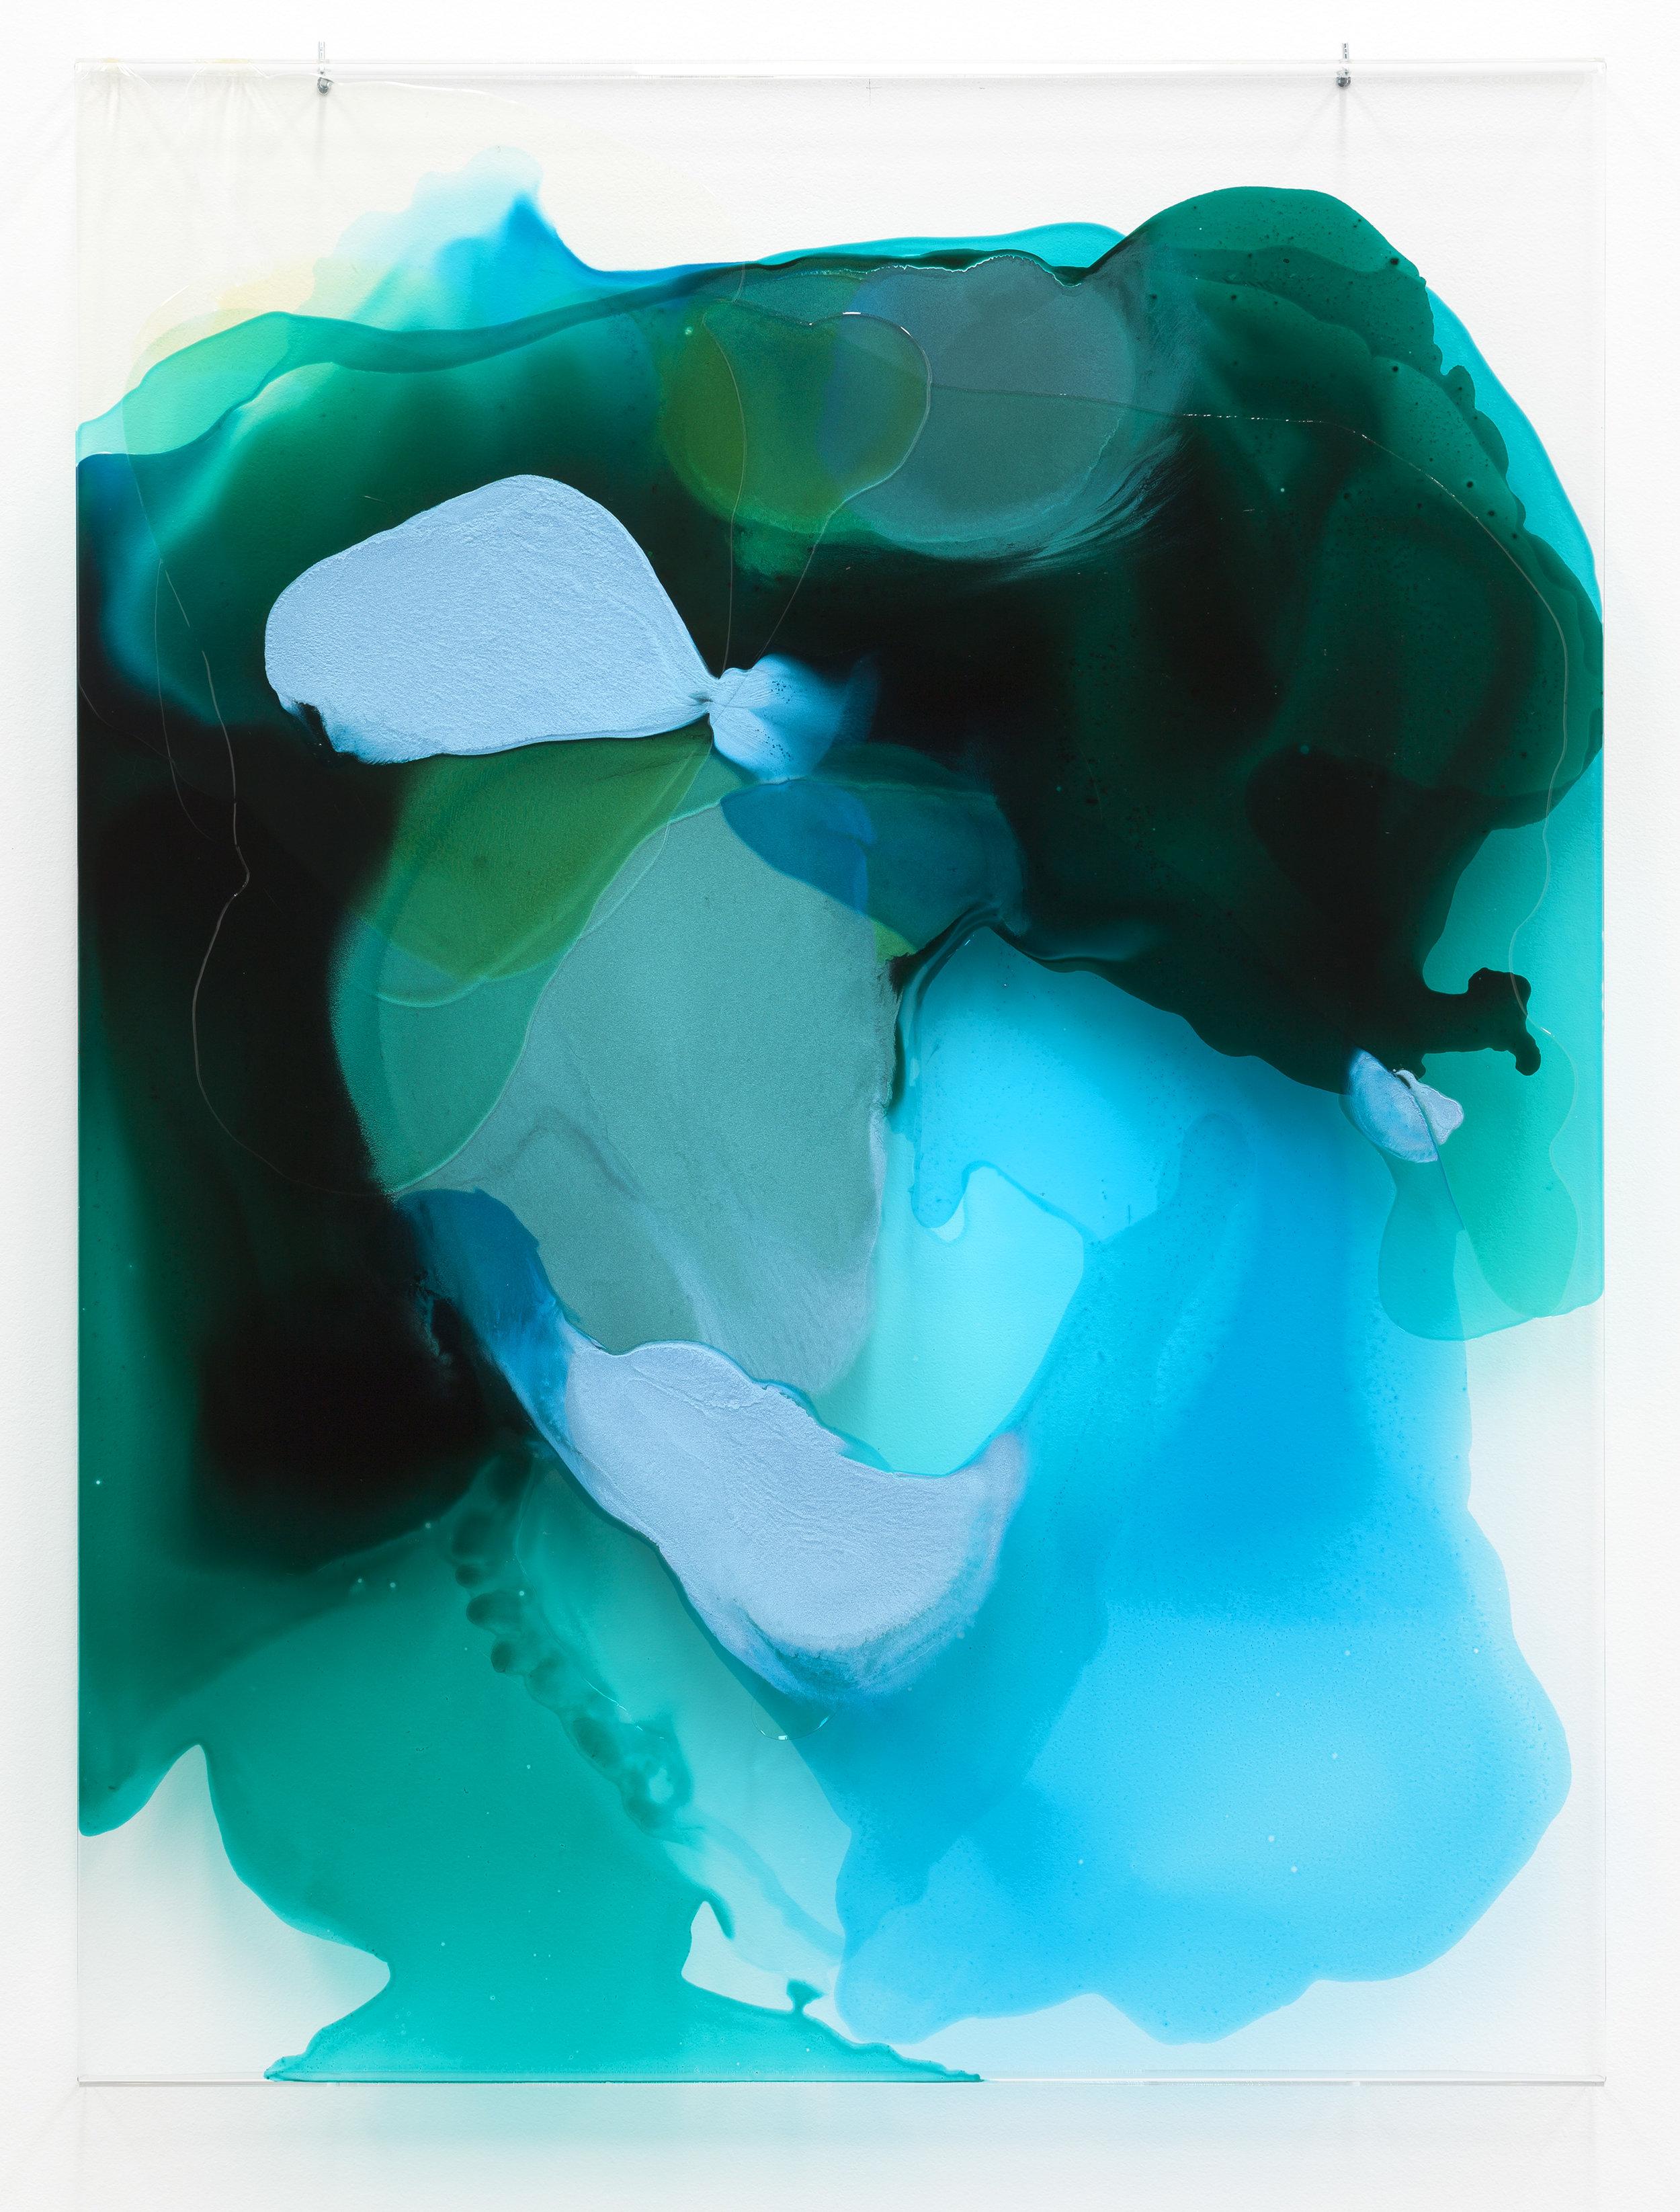 Oceanic - Susie Leahy Raleigh, 80x60cm.jpg